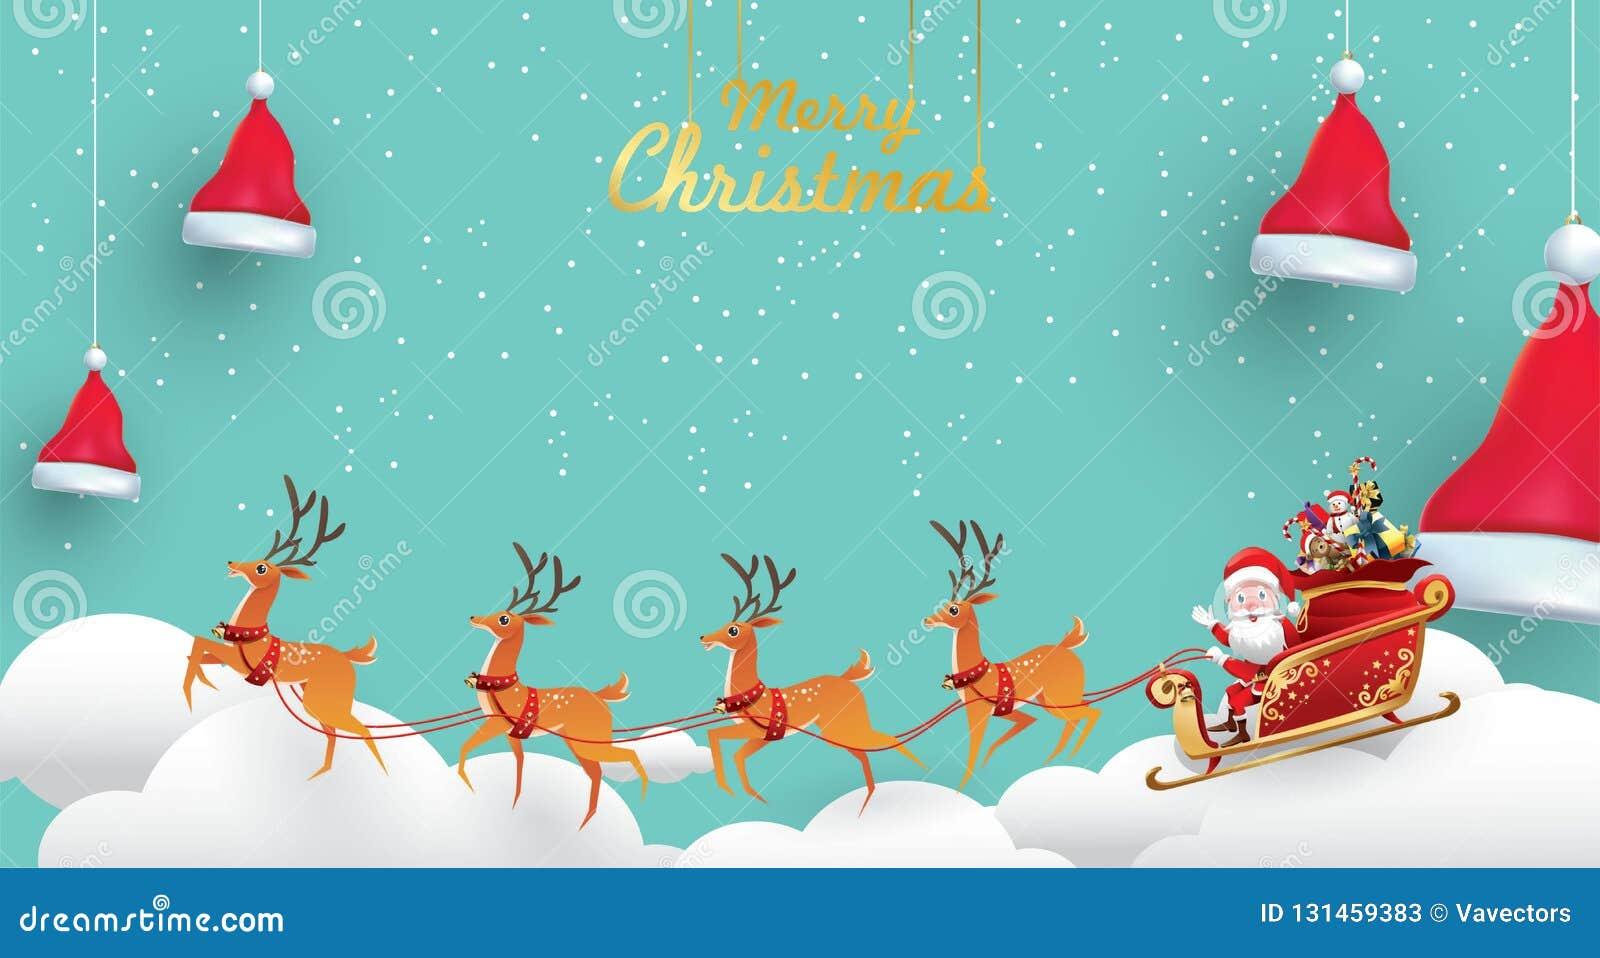 Premium Vector | Merry christmas. happy new year. funny